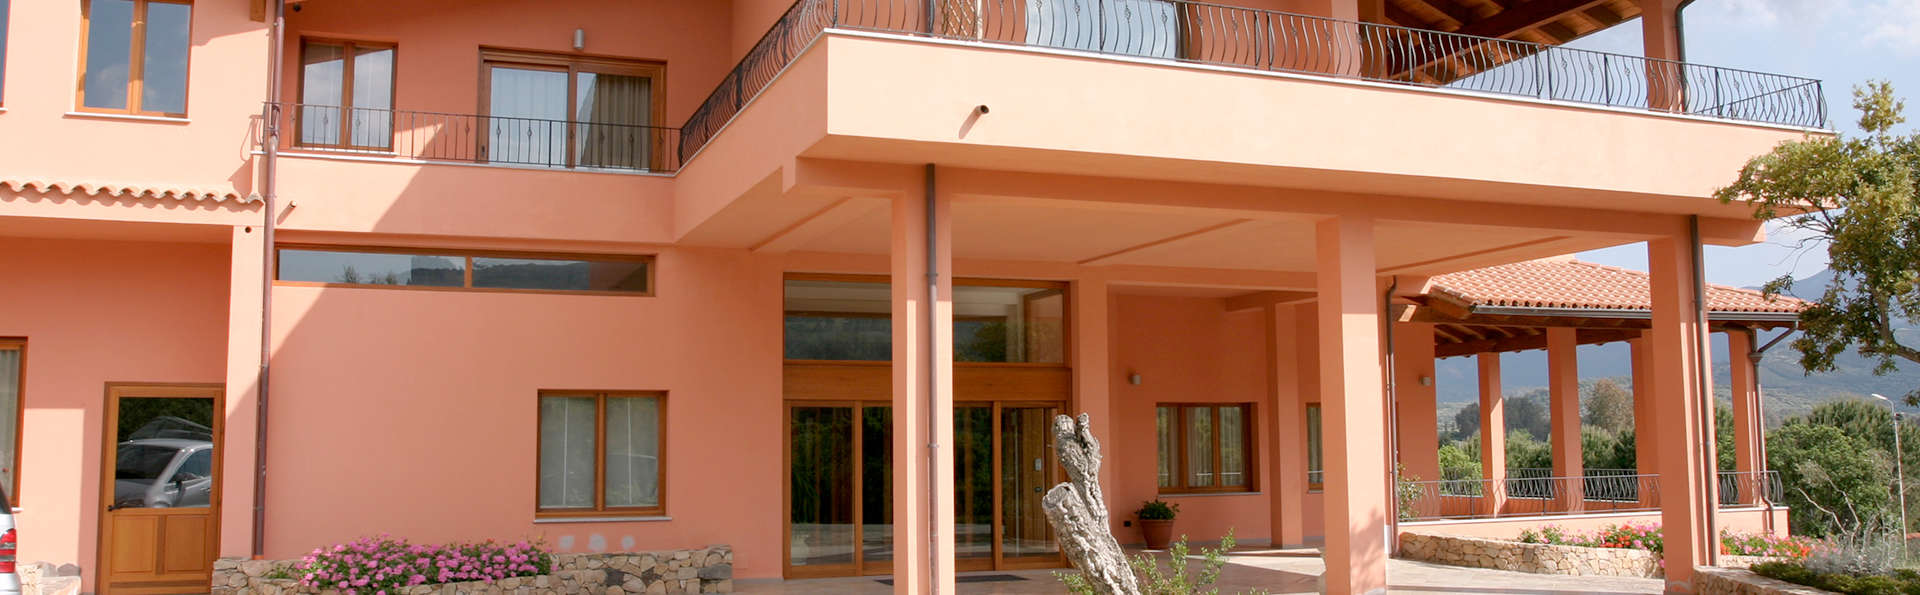 Hotel & Resort Sa Rocca - Edit_Front5.jpg